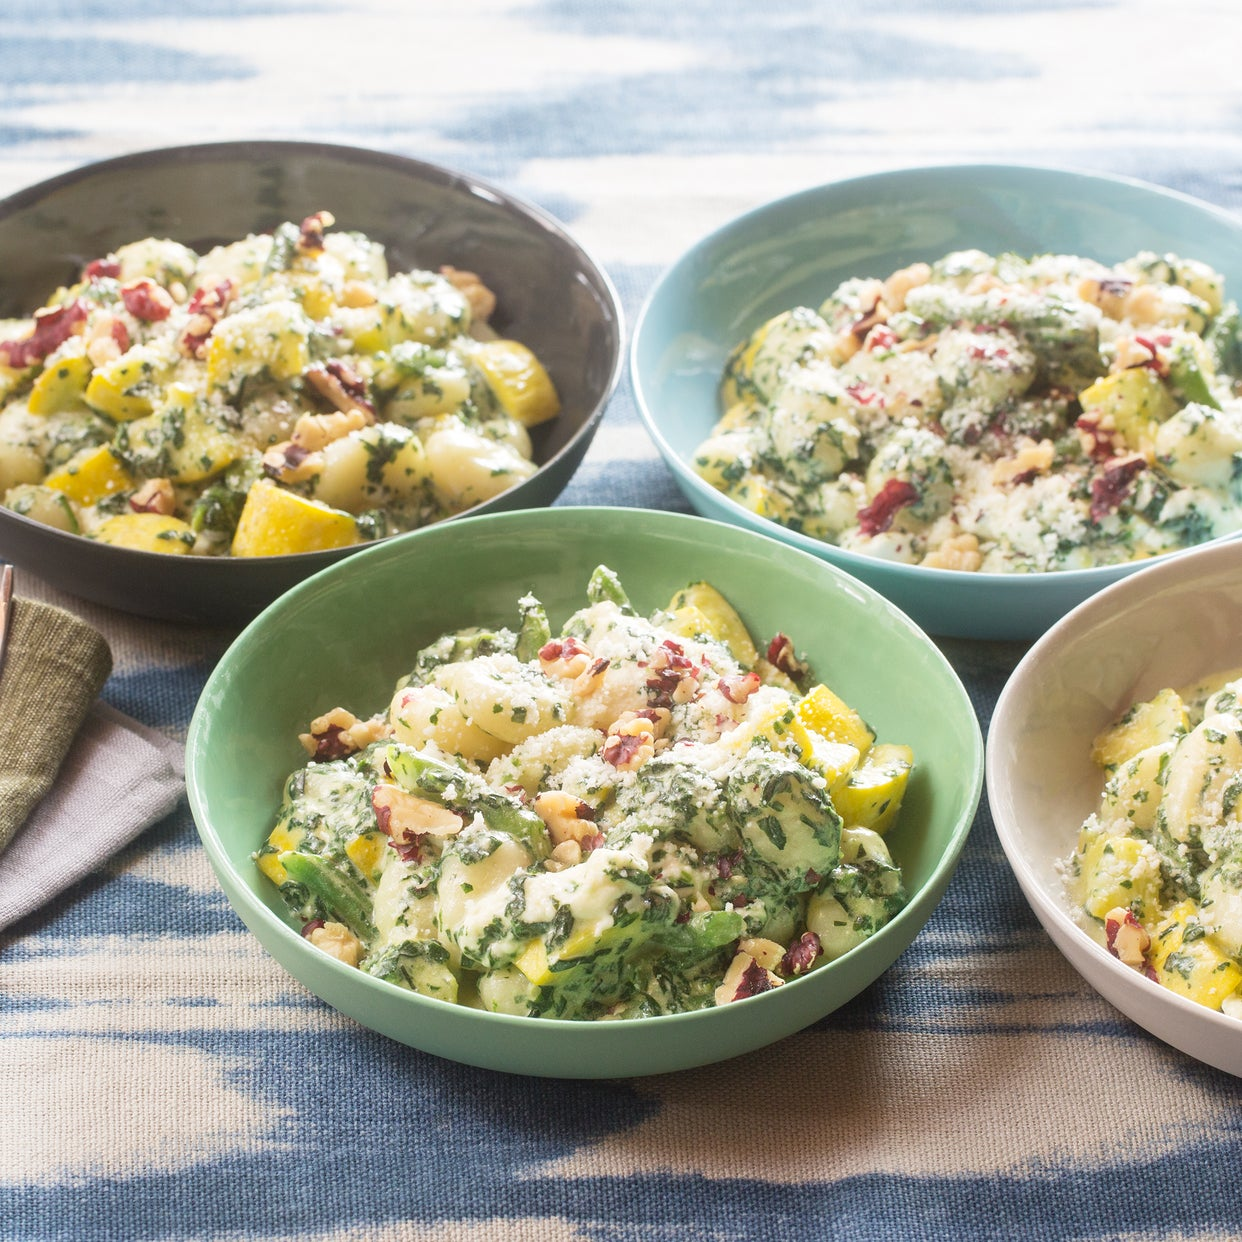 Spinach & Basil Pesto Gnocchi with Summer Squash, Green Beans & Fresh Mozzarella